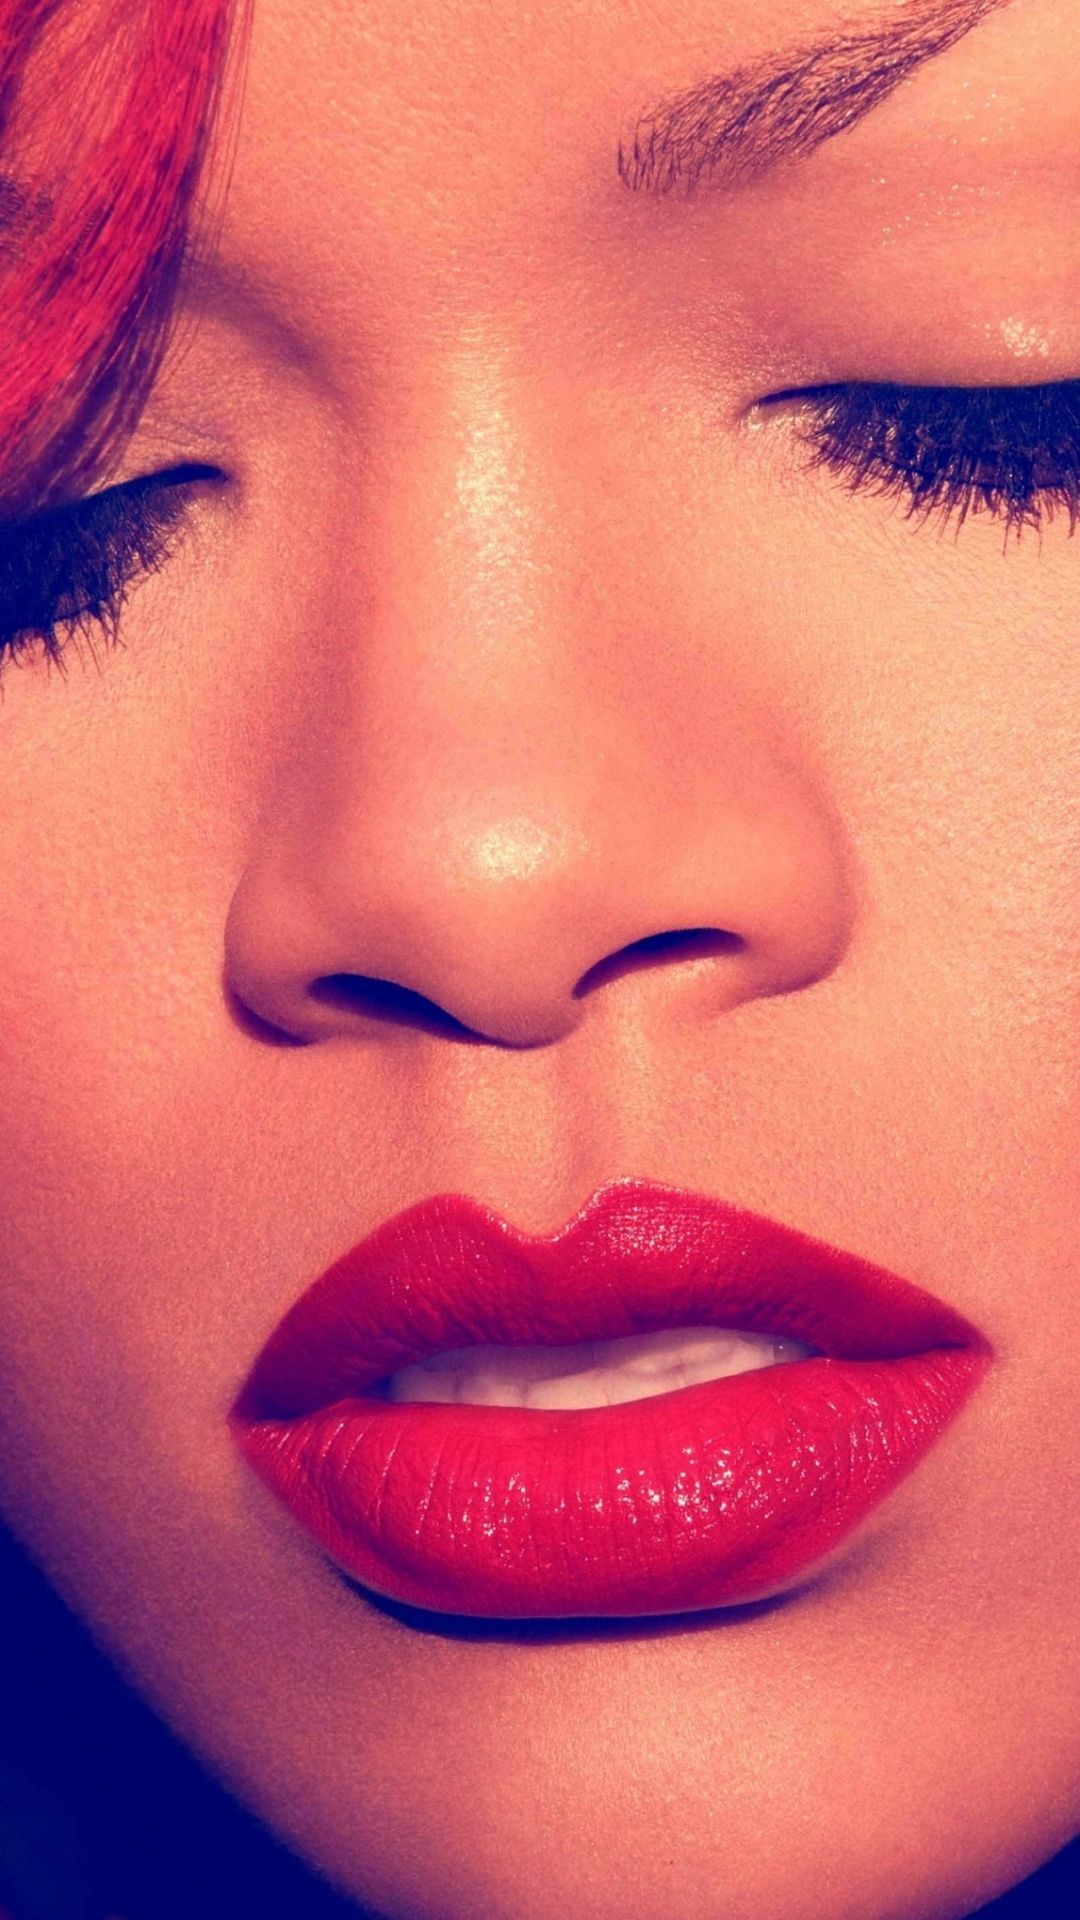 Iphone 6 Plus Music Rihanna Wallpaper Id 349489 Rihanna Album Cover Rihanna Albums Rihanna Love